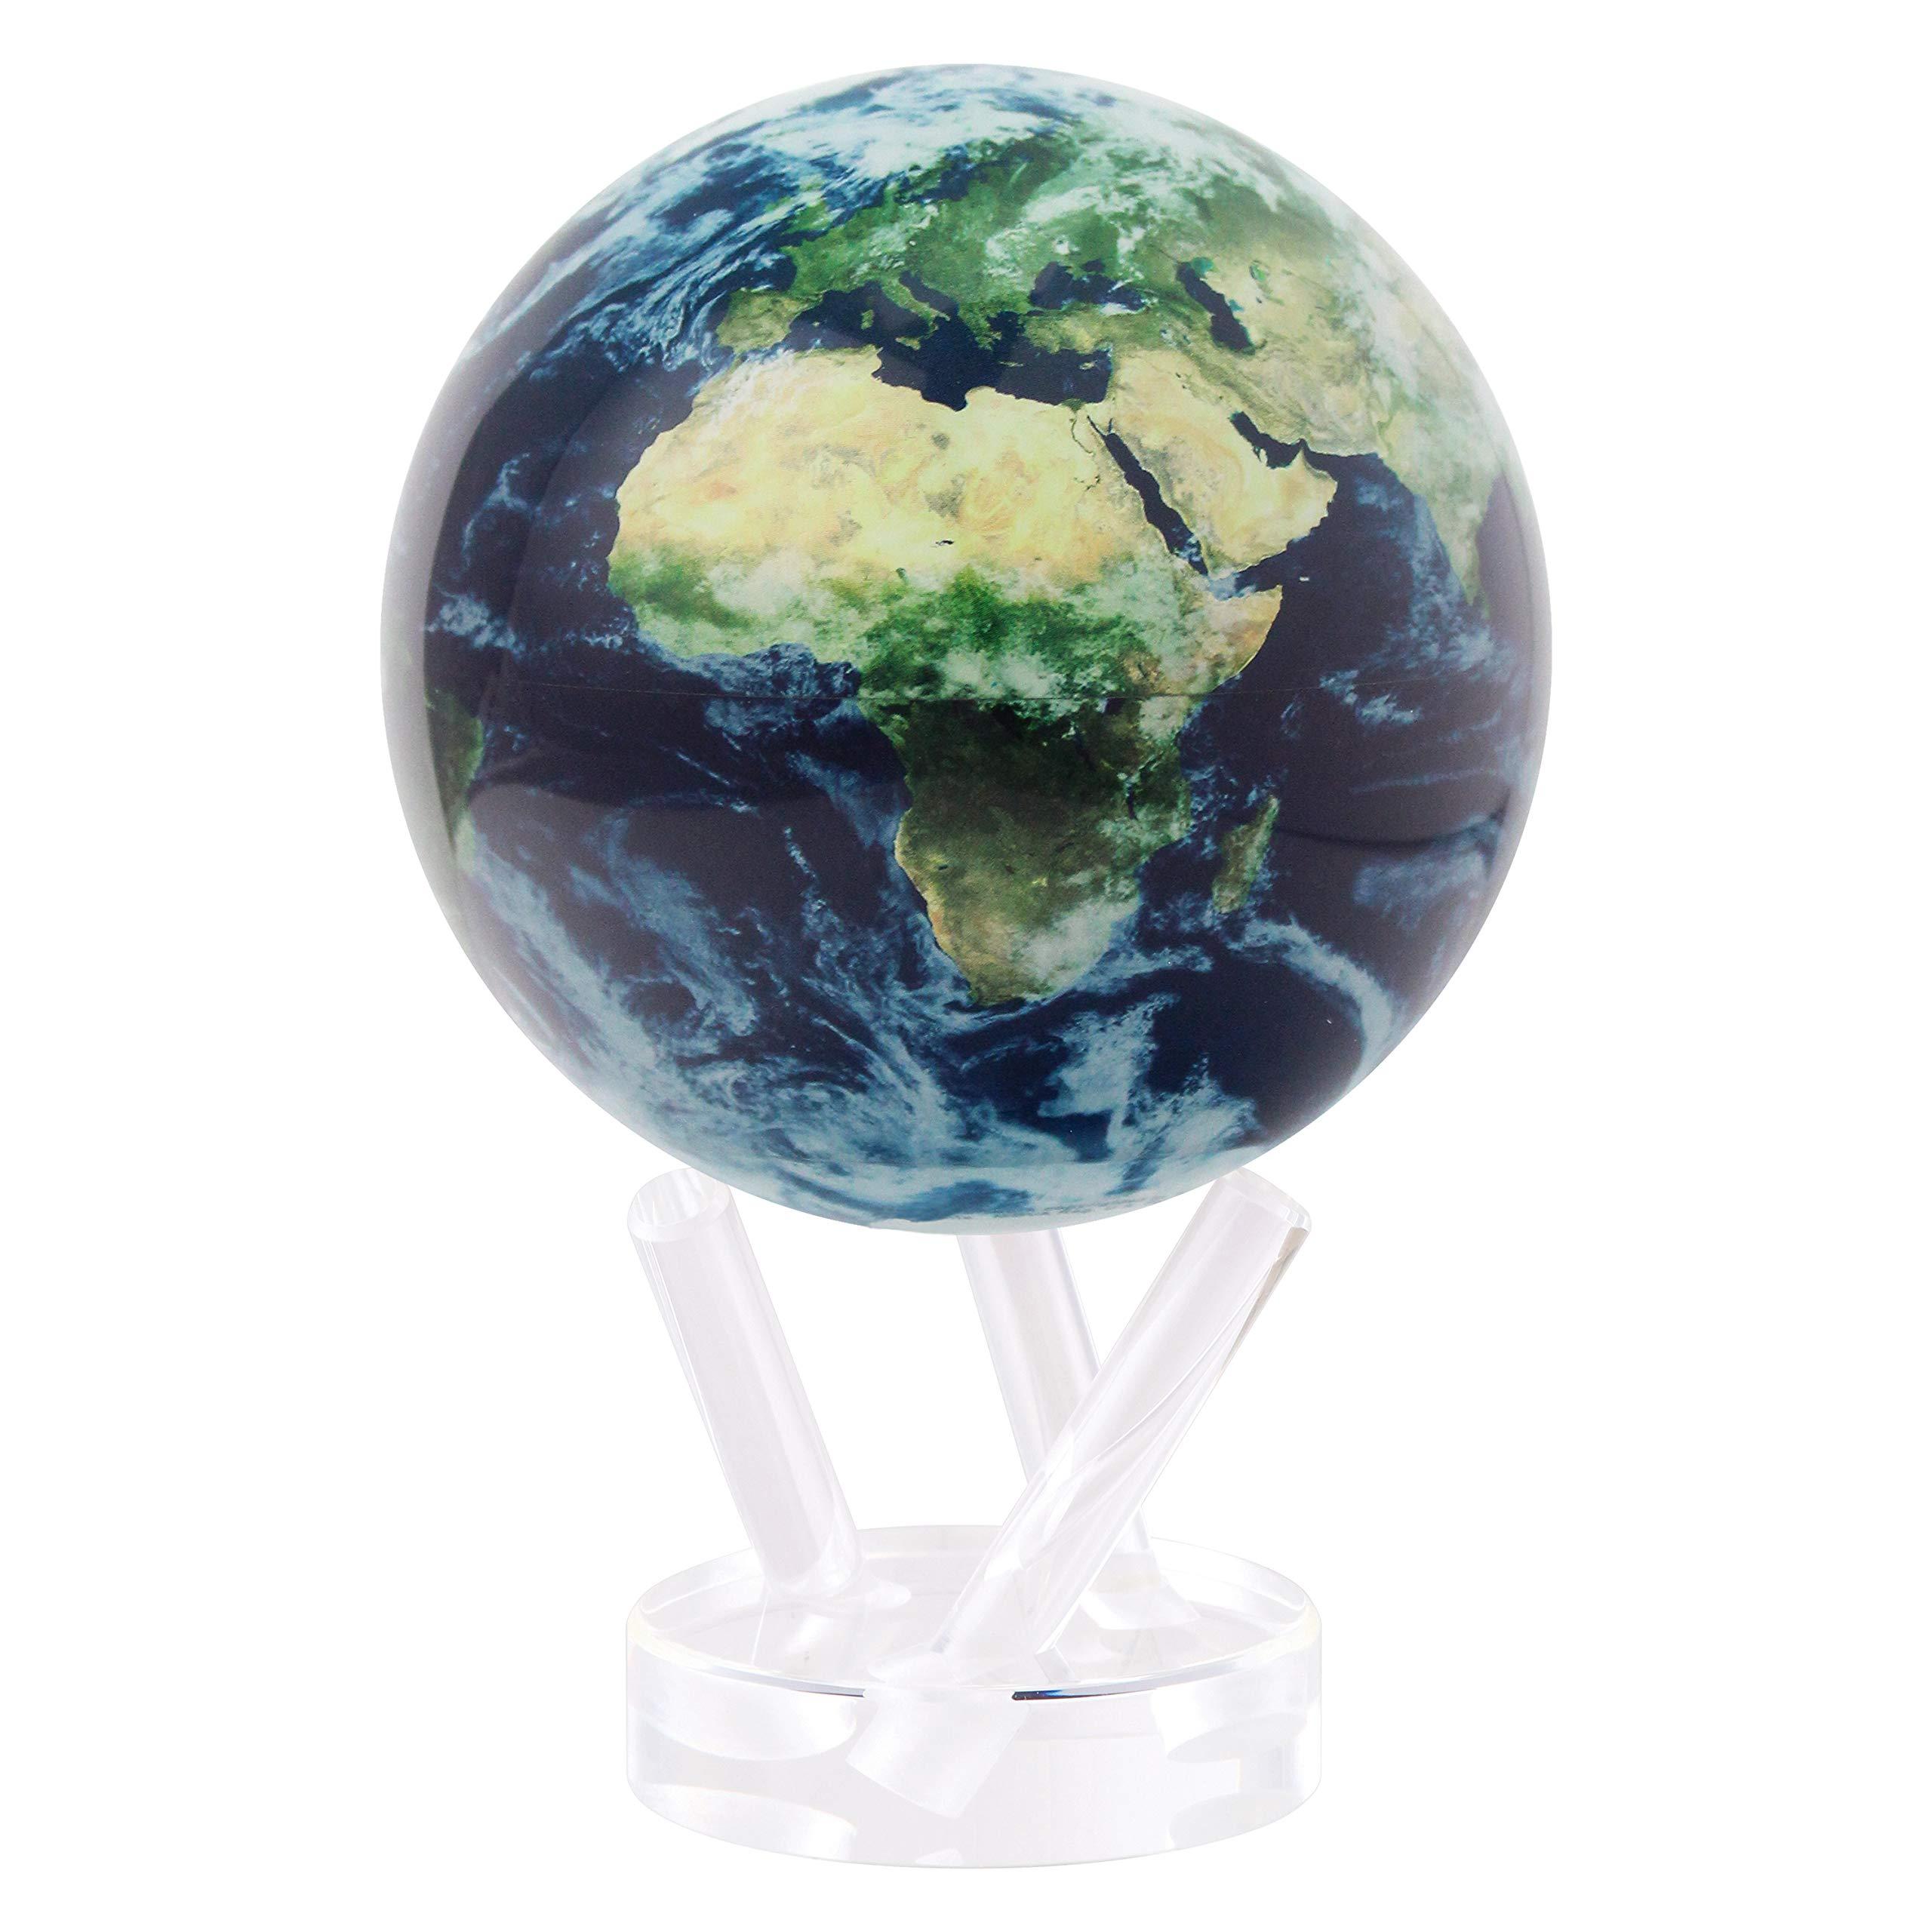 Mova Rotating Globe Natural Earth Satellite 4.5 inch.